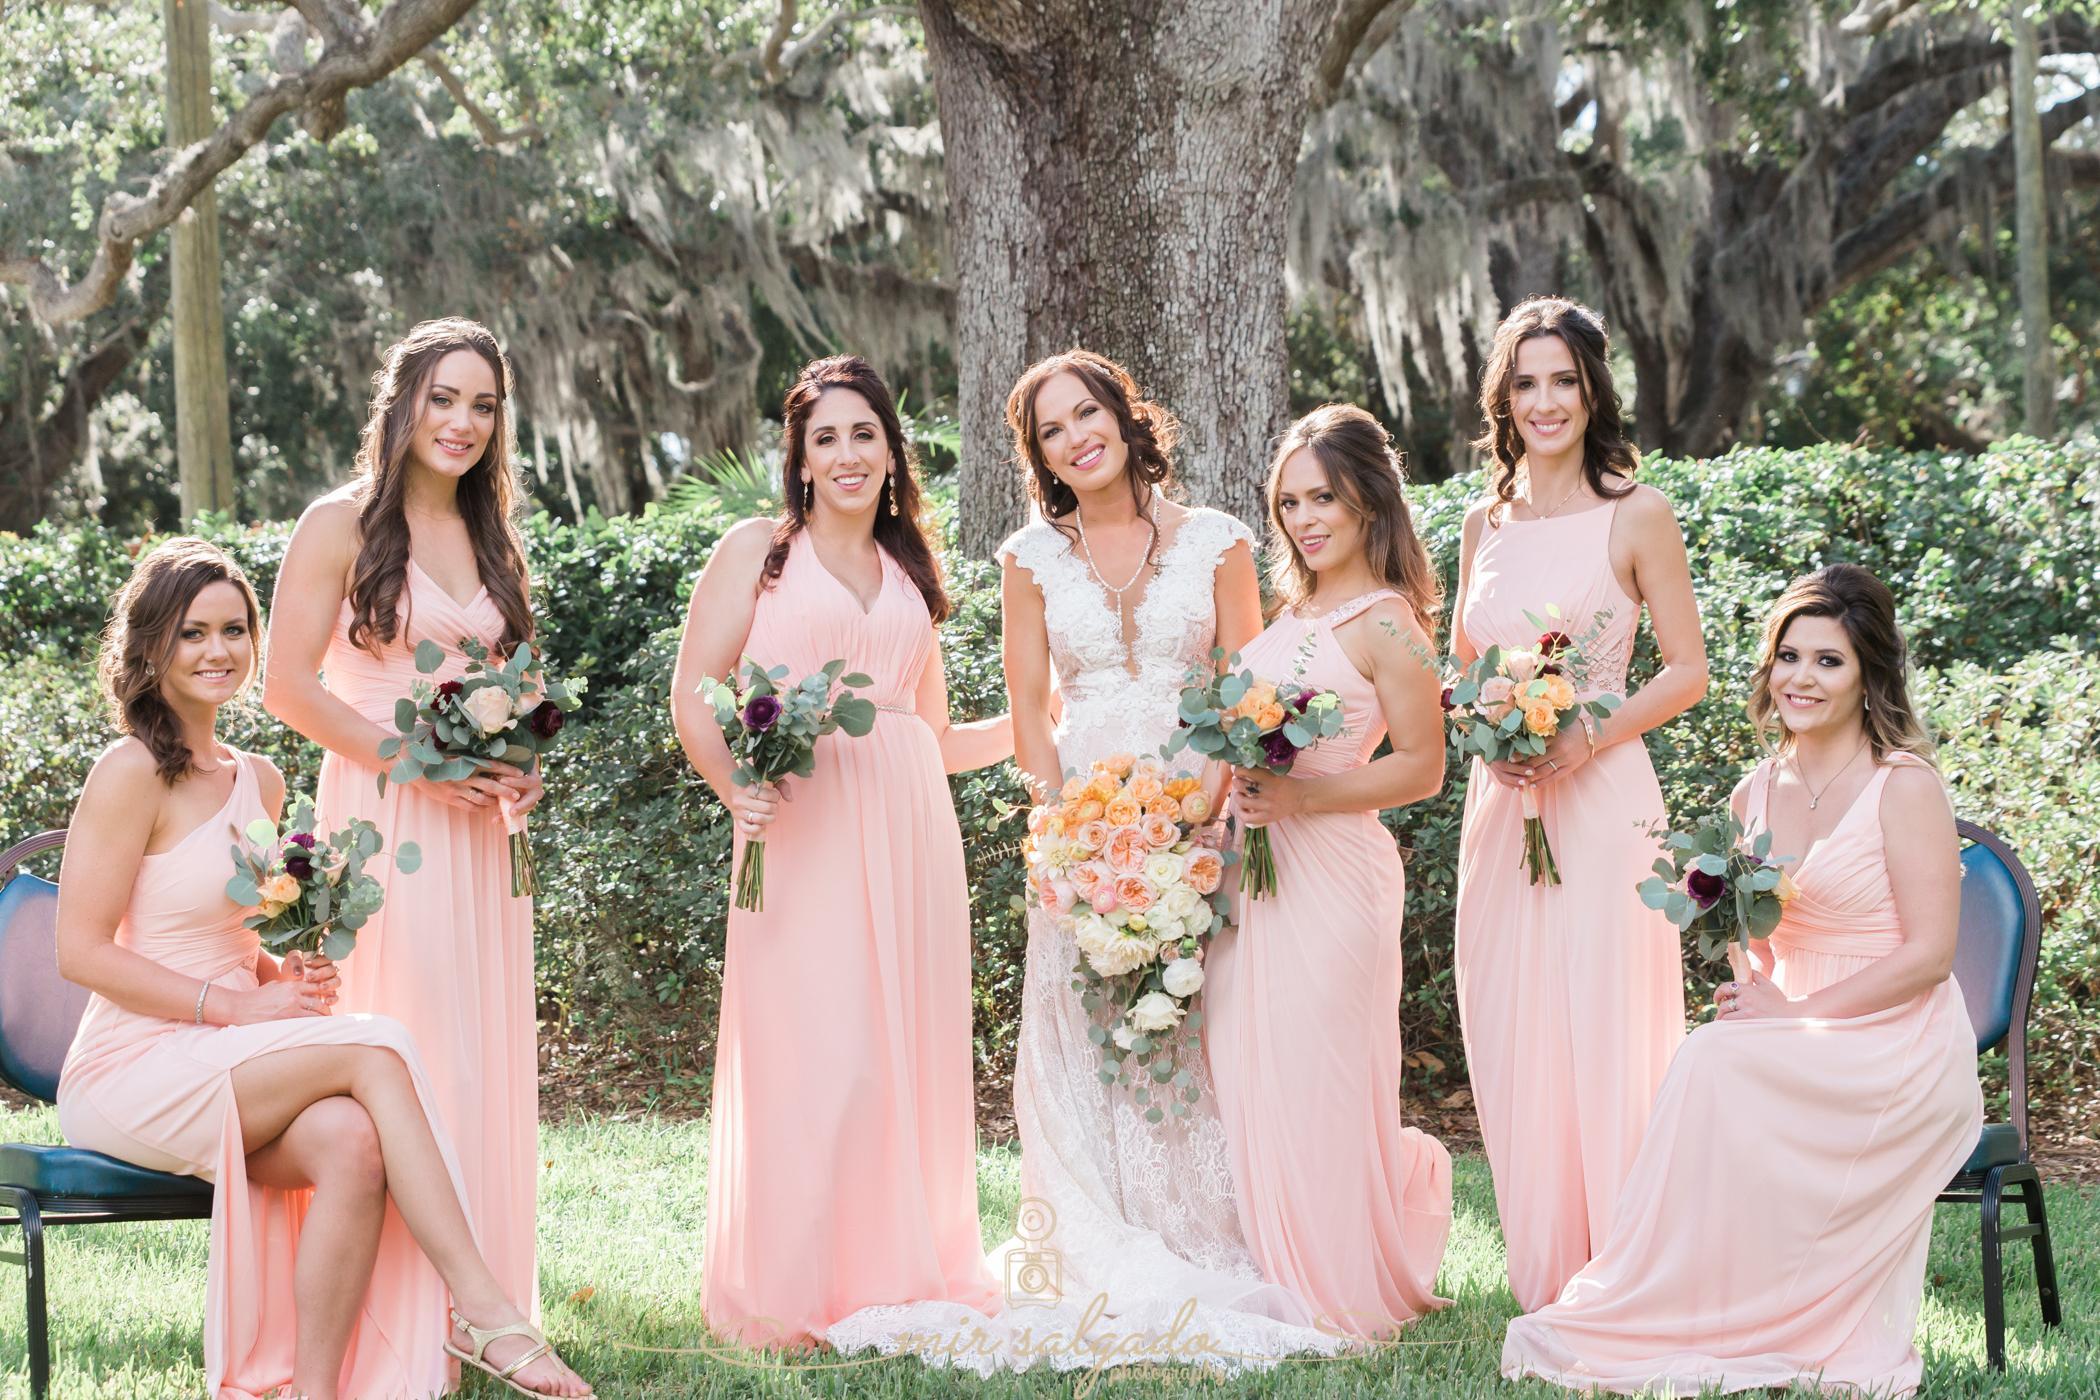 bridesmaids-wedding-photo, Tampa-yacht-club-wedding, bridesmaids-photo